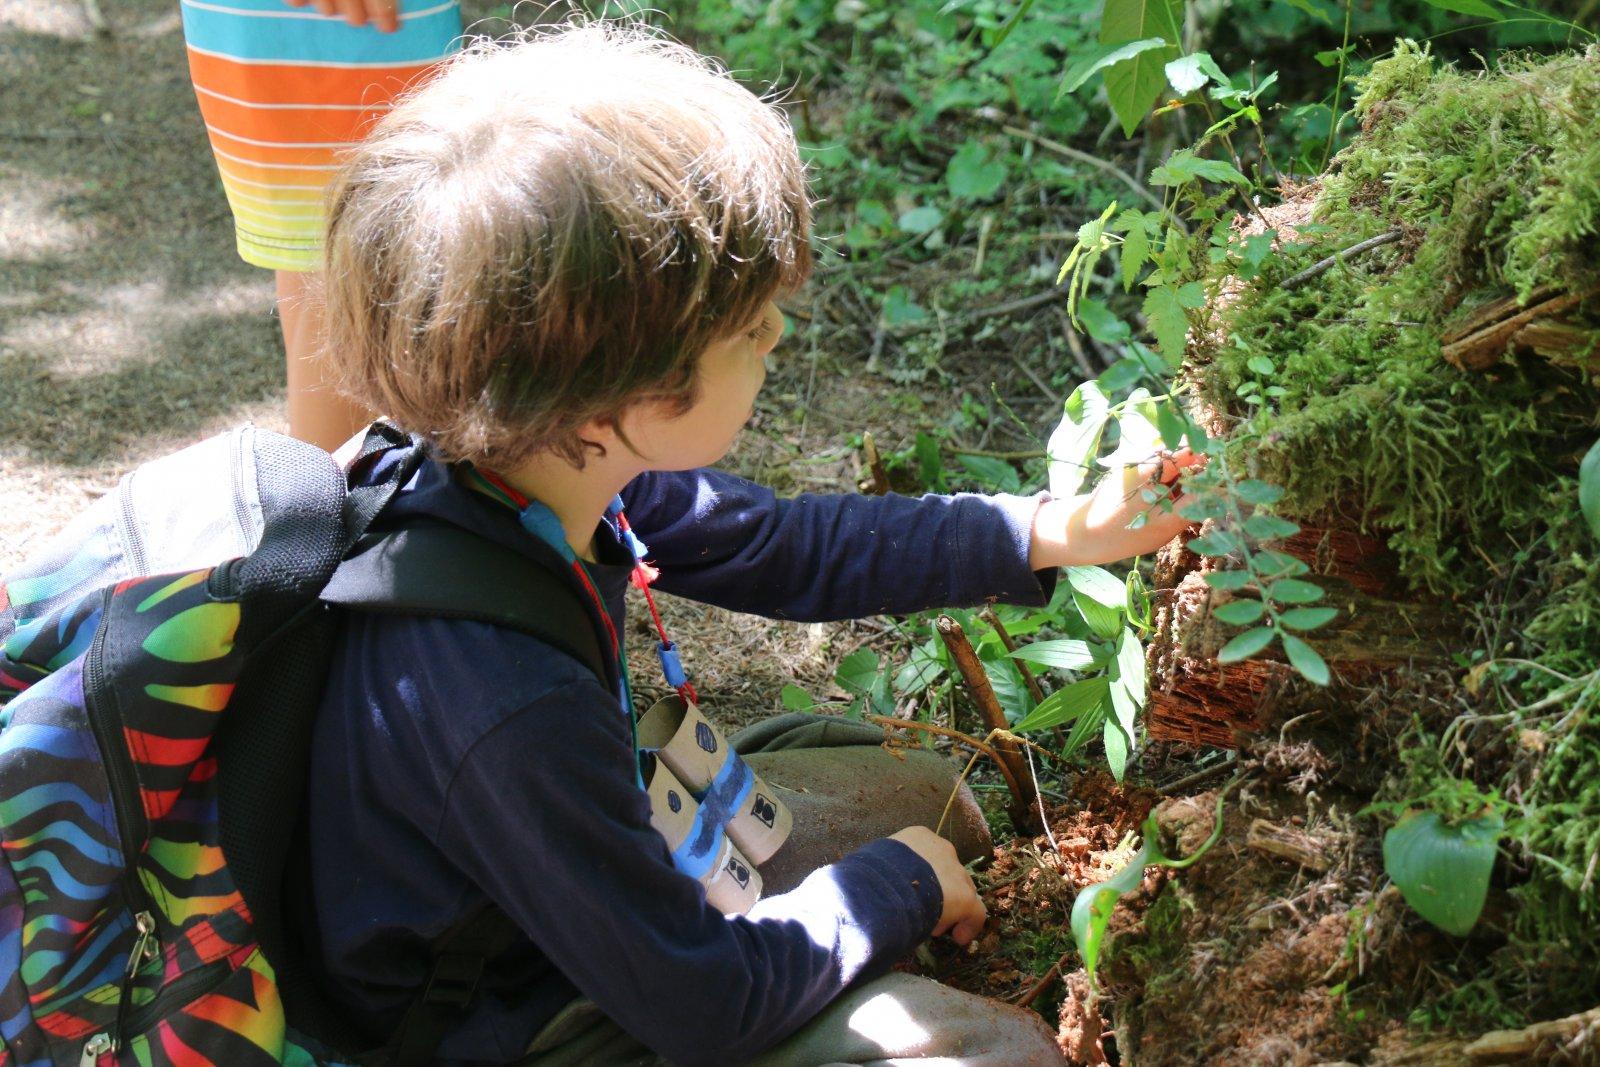 Boy making a bird's nest in Saturday Academy class